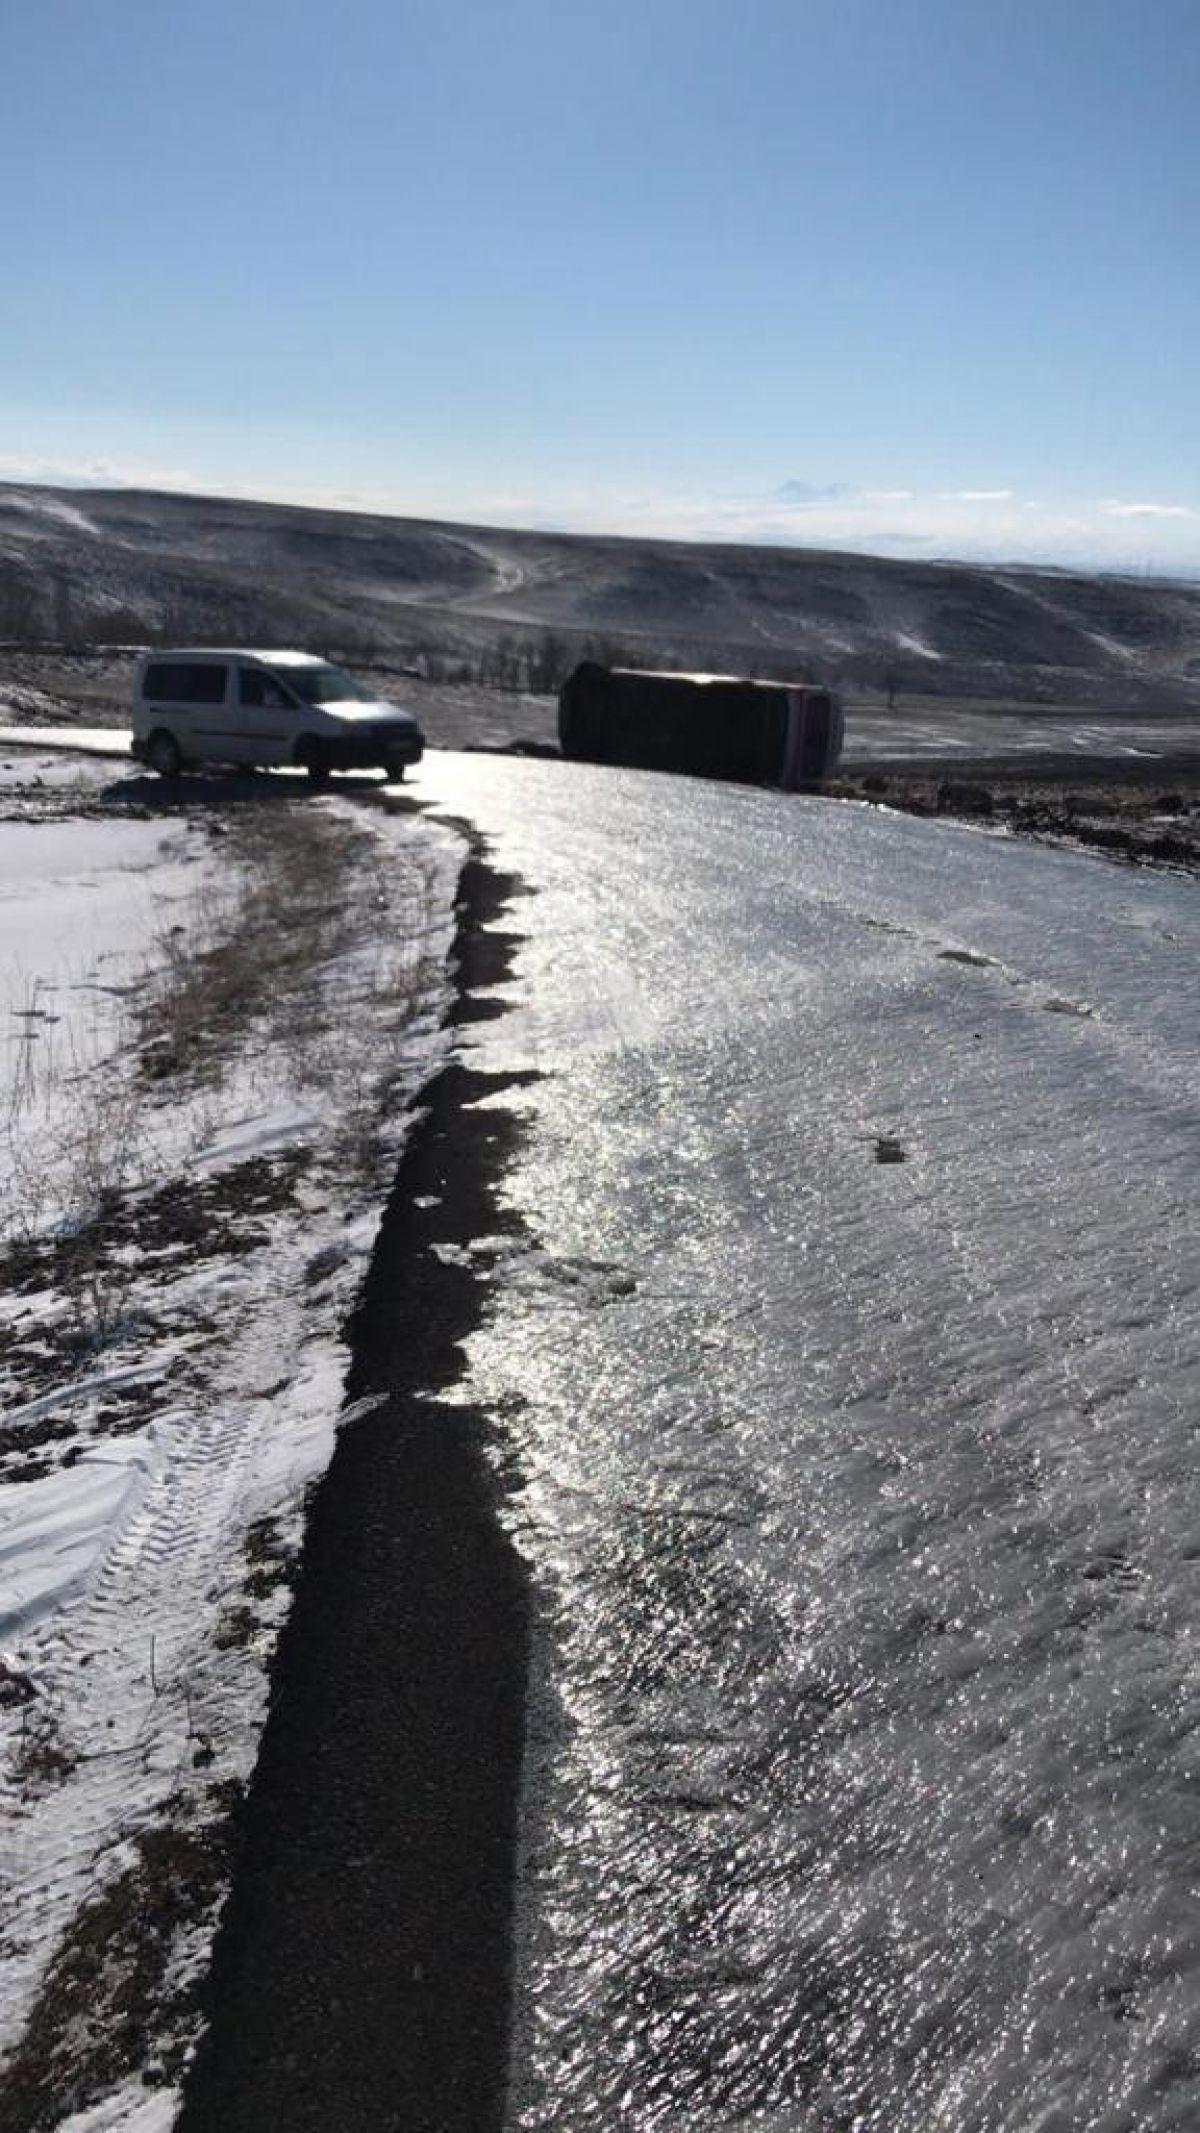 Kars'ta hasta almaya giden ambulans takla attı: 3 yaralı #4